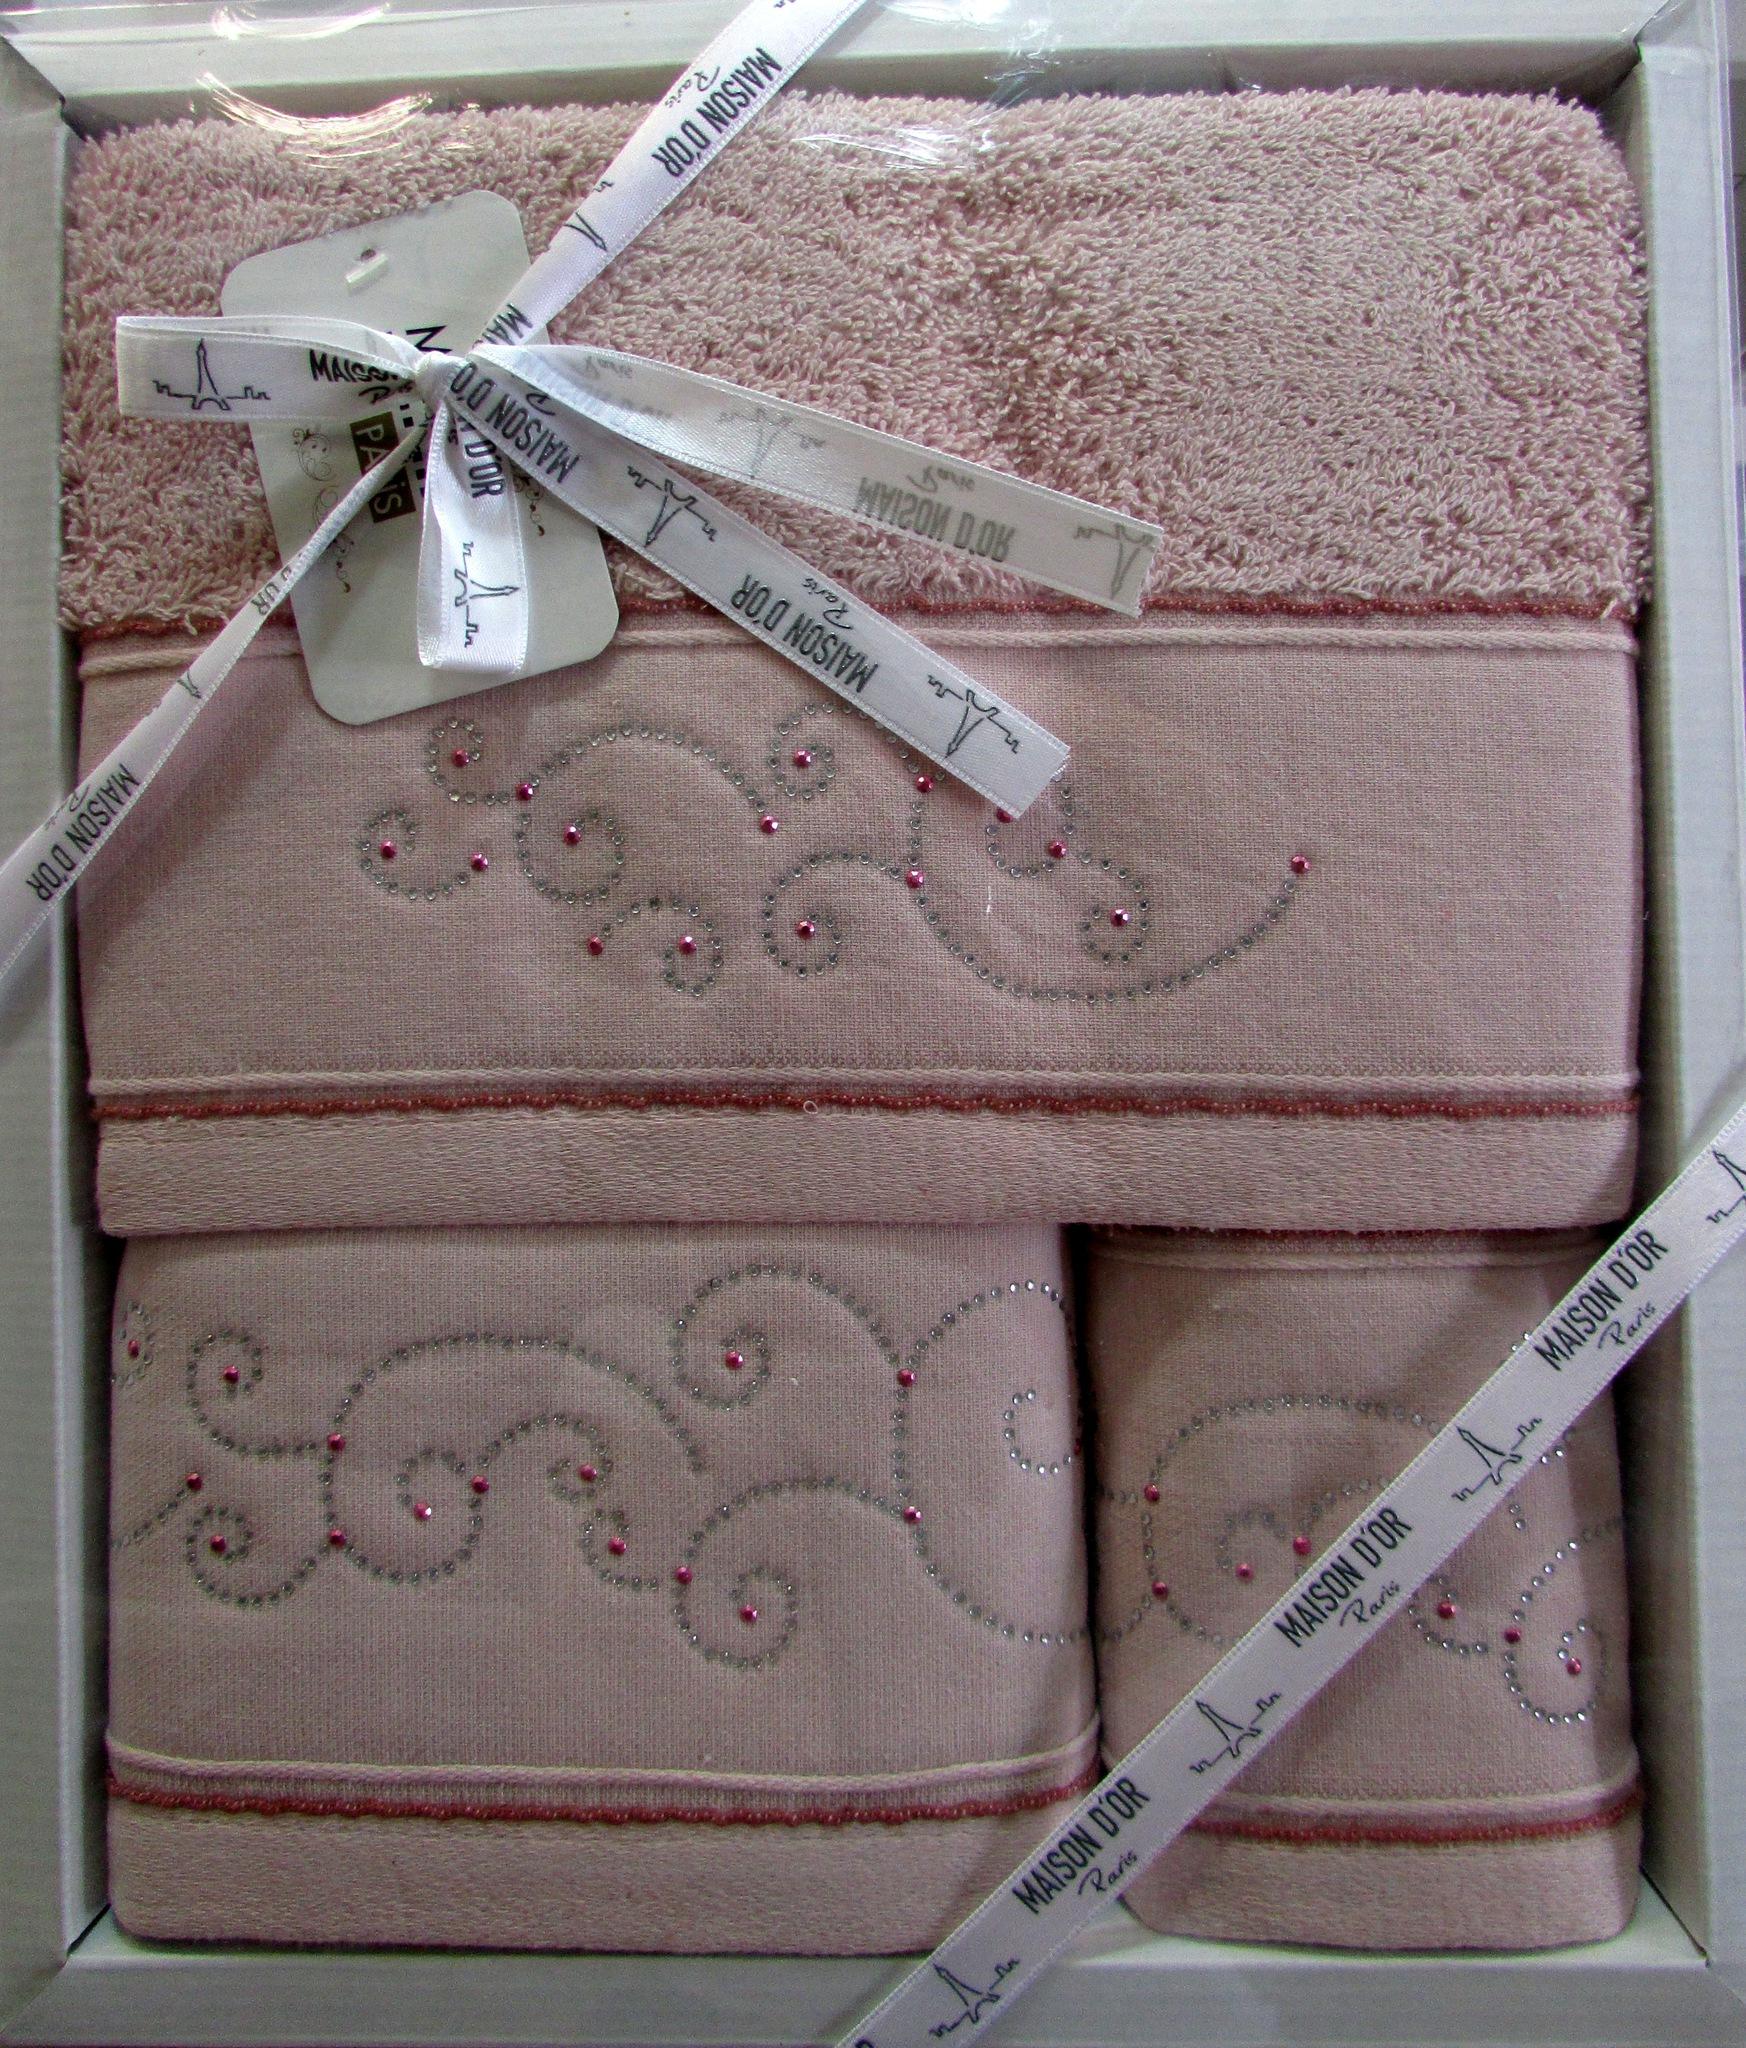 Наборы полотенец Набор полотенец  DALIY - ДАЛИИ 3пр 30х50 50х90 и 70х140 Maison Dor (Турция) далии_гр.розов_3шт.jpg